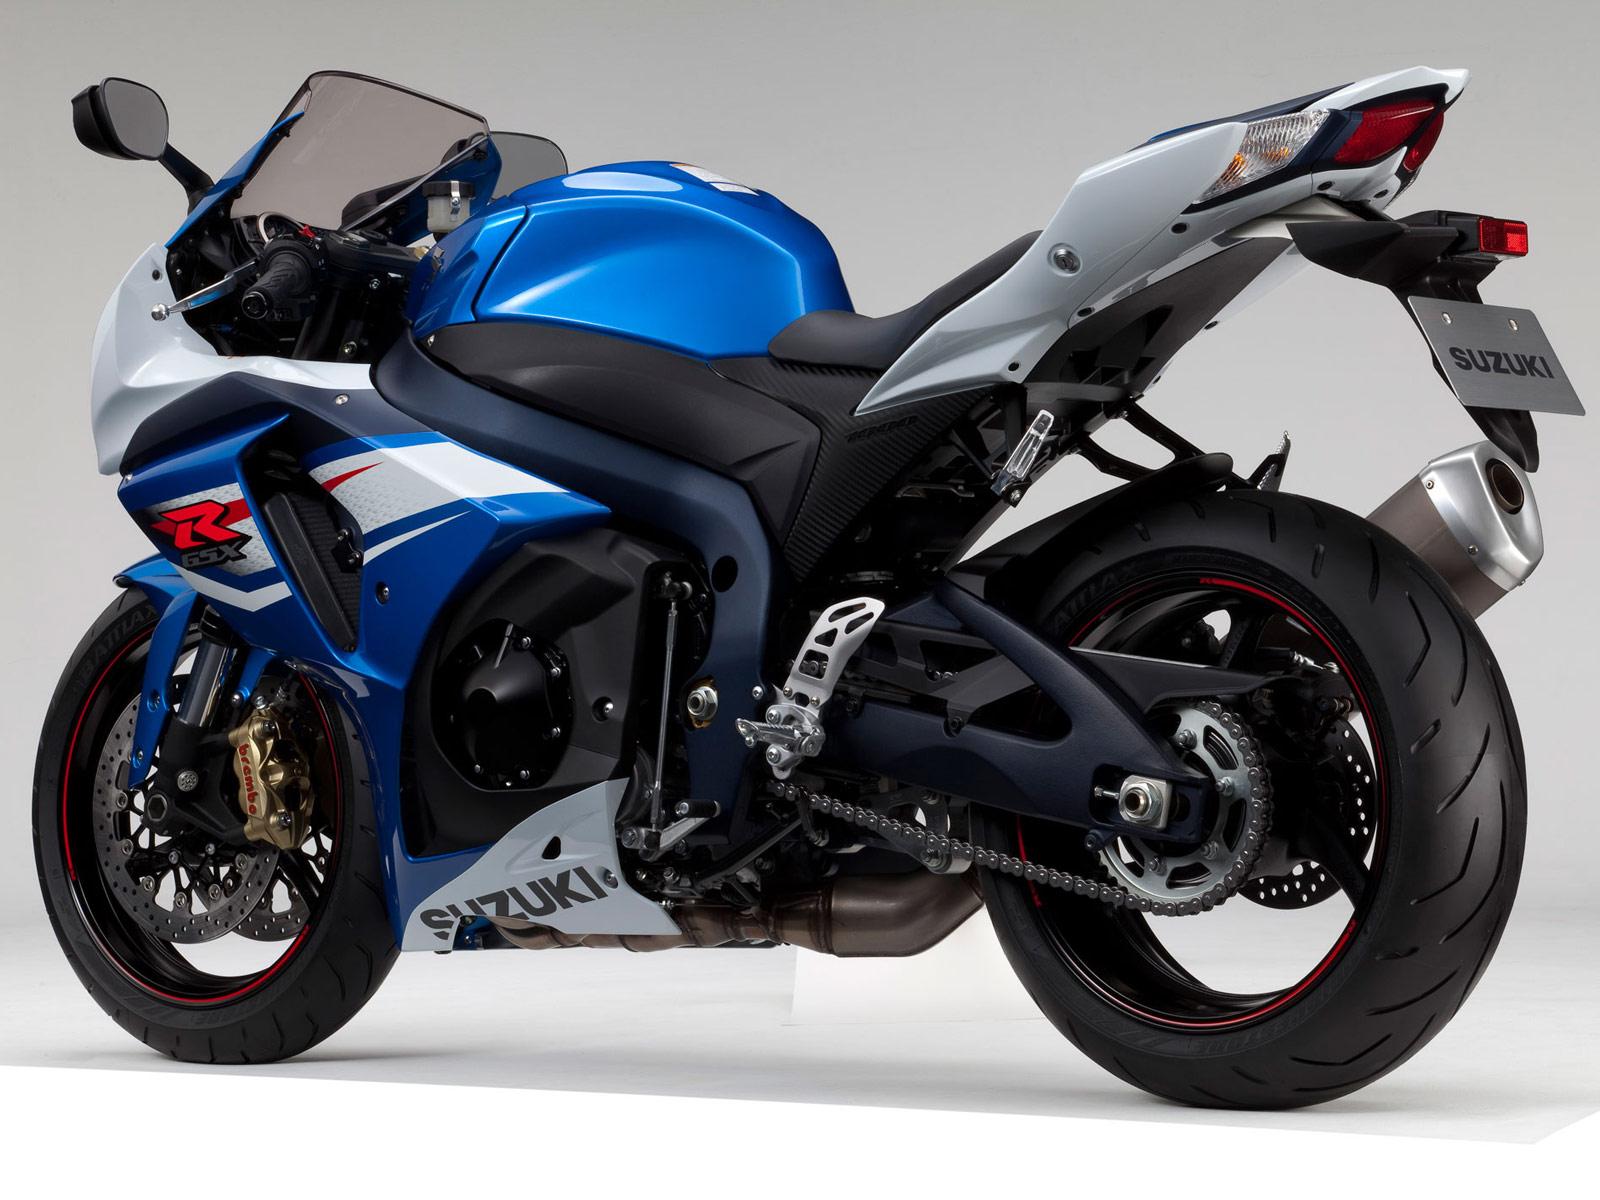 http://4.bp.blogspot.com/-hi-qoizbfhY/Twq-di1G87I/AAAAAAAAGP4/96r1eTCgjZM/s1600/2012-Suzuki-GSX-R1000_motorcycle-desktop-wallpaper-7.jpg